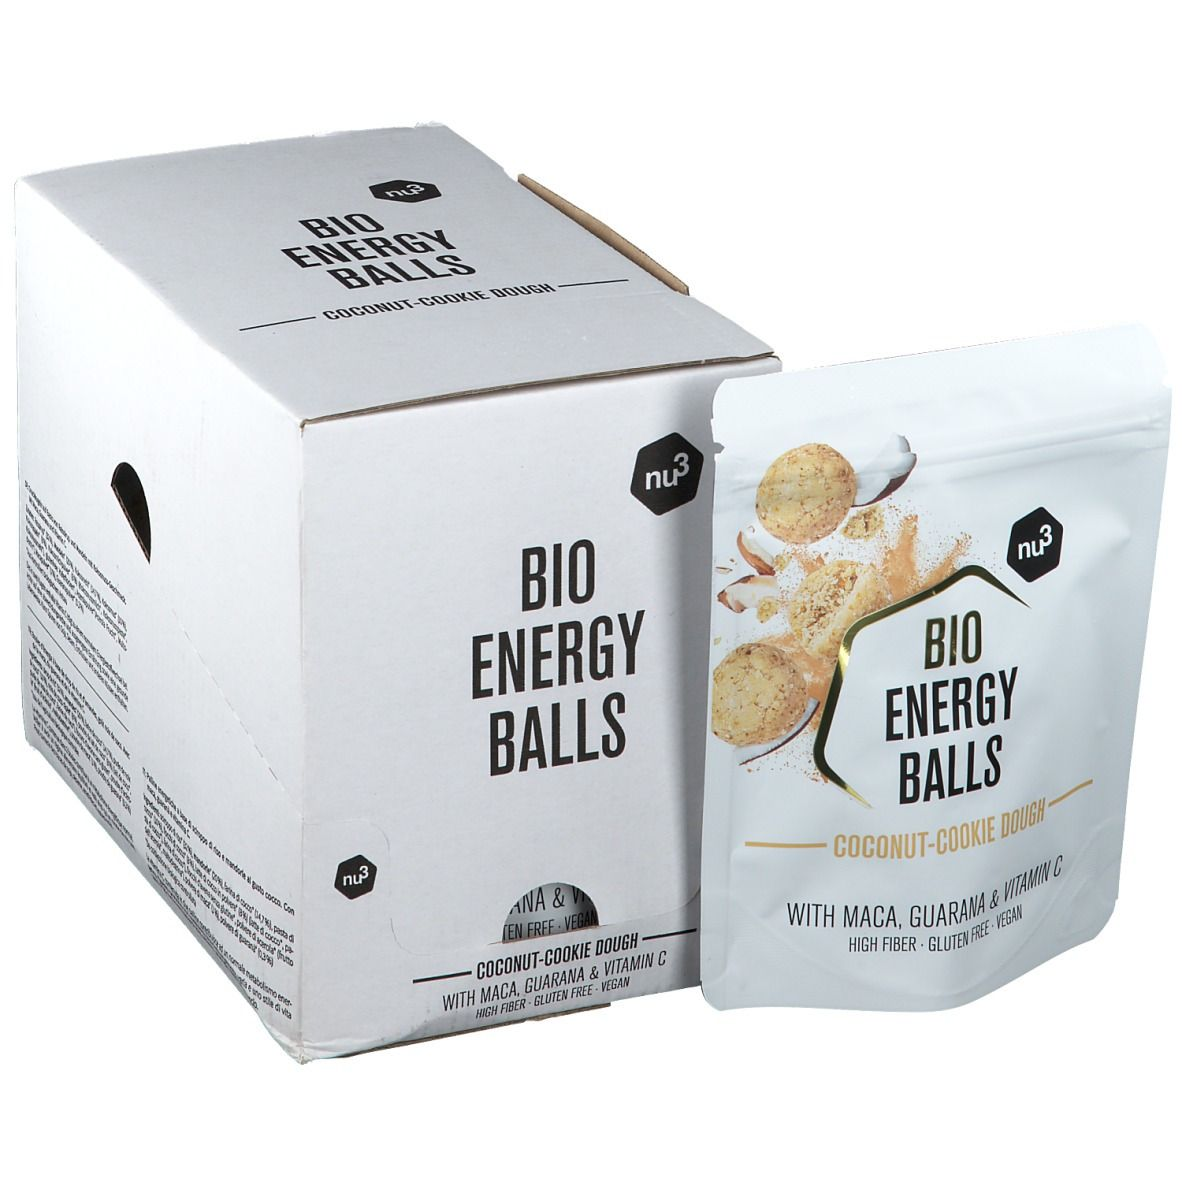 Nu3 Bio Energy Balls Coconut-Cookie Dough